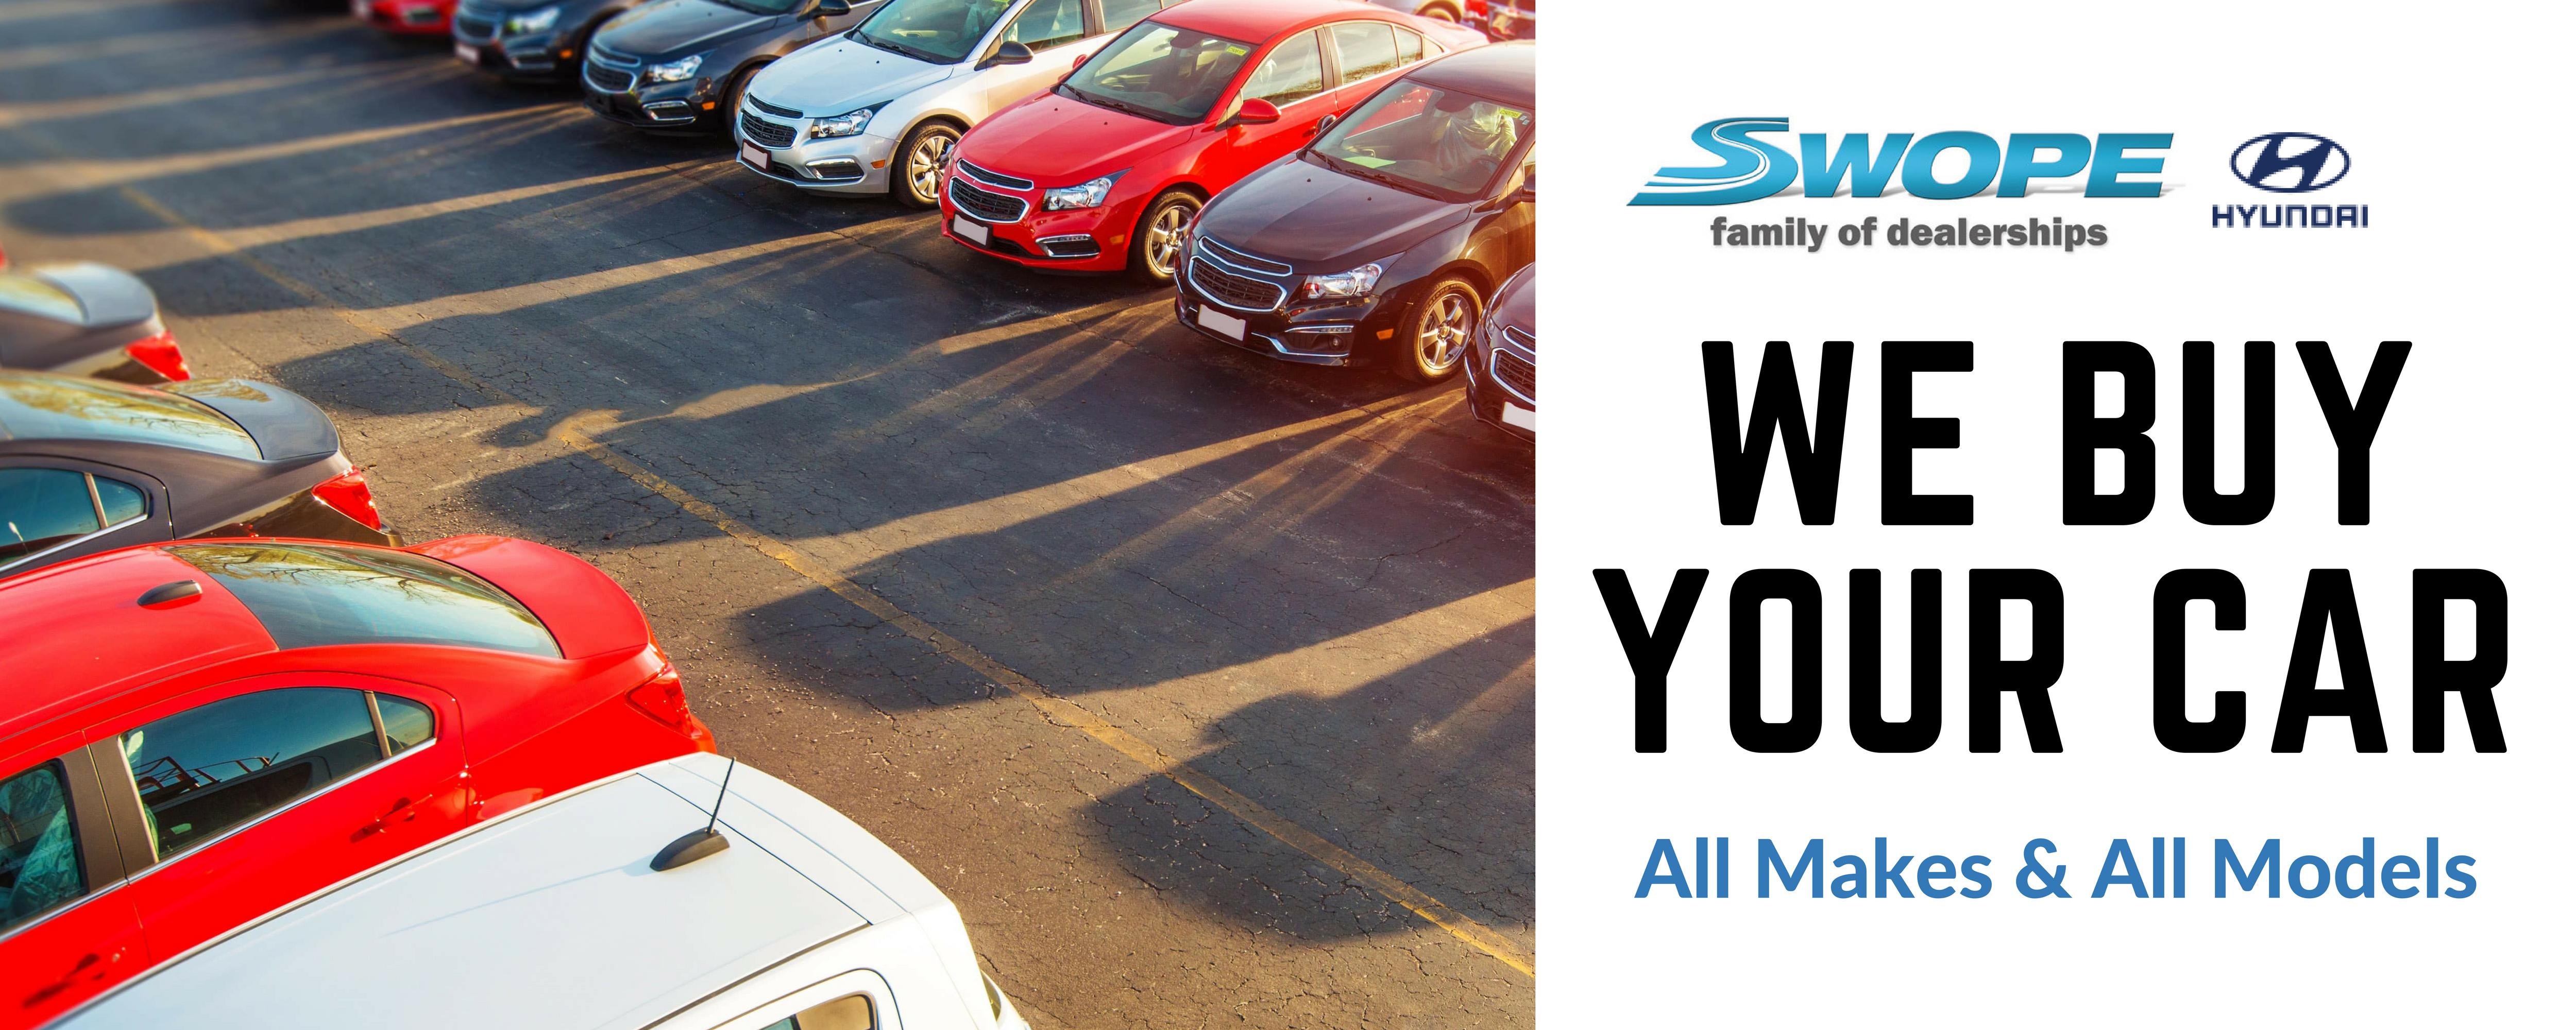 Swope Hyundai   New Hyundai dealership in Elizabethtown, KY 42701